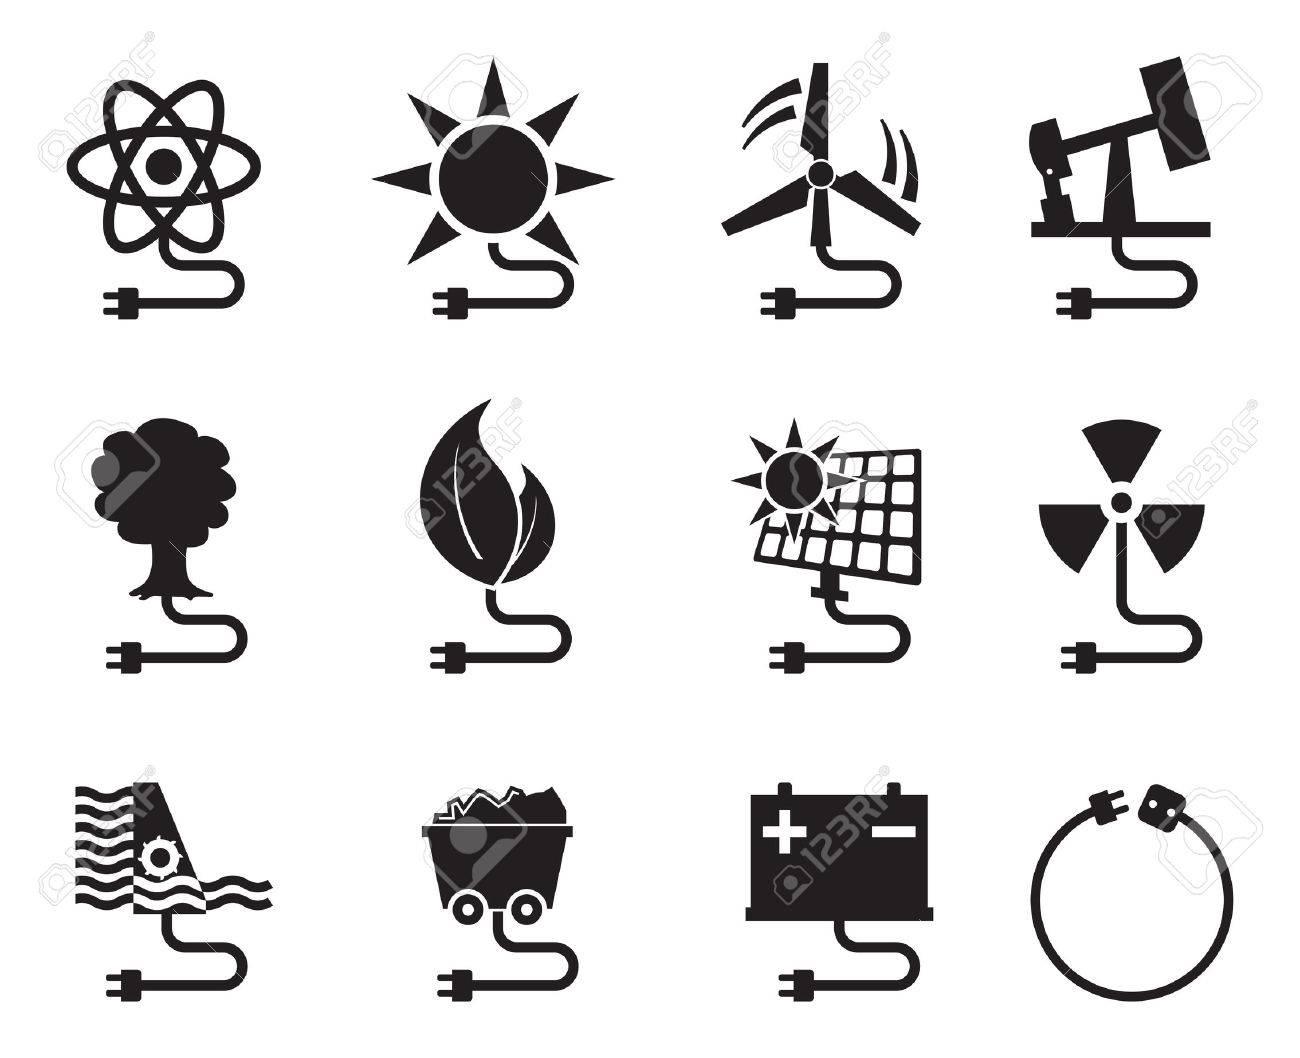 Energy icon energy source electricity power resource set vector - 52727568